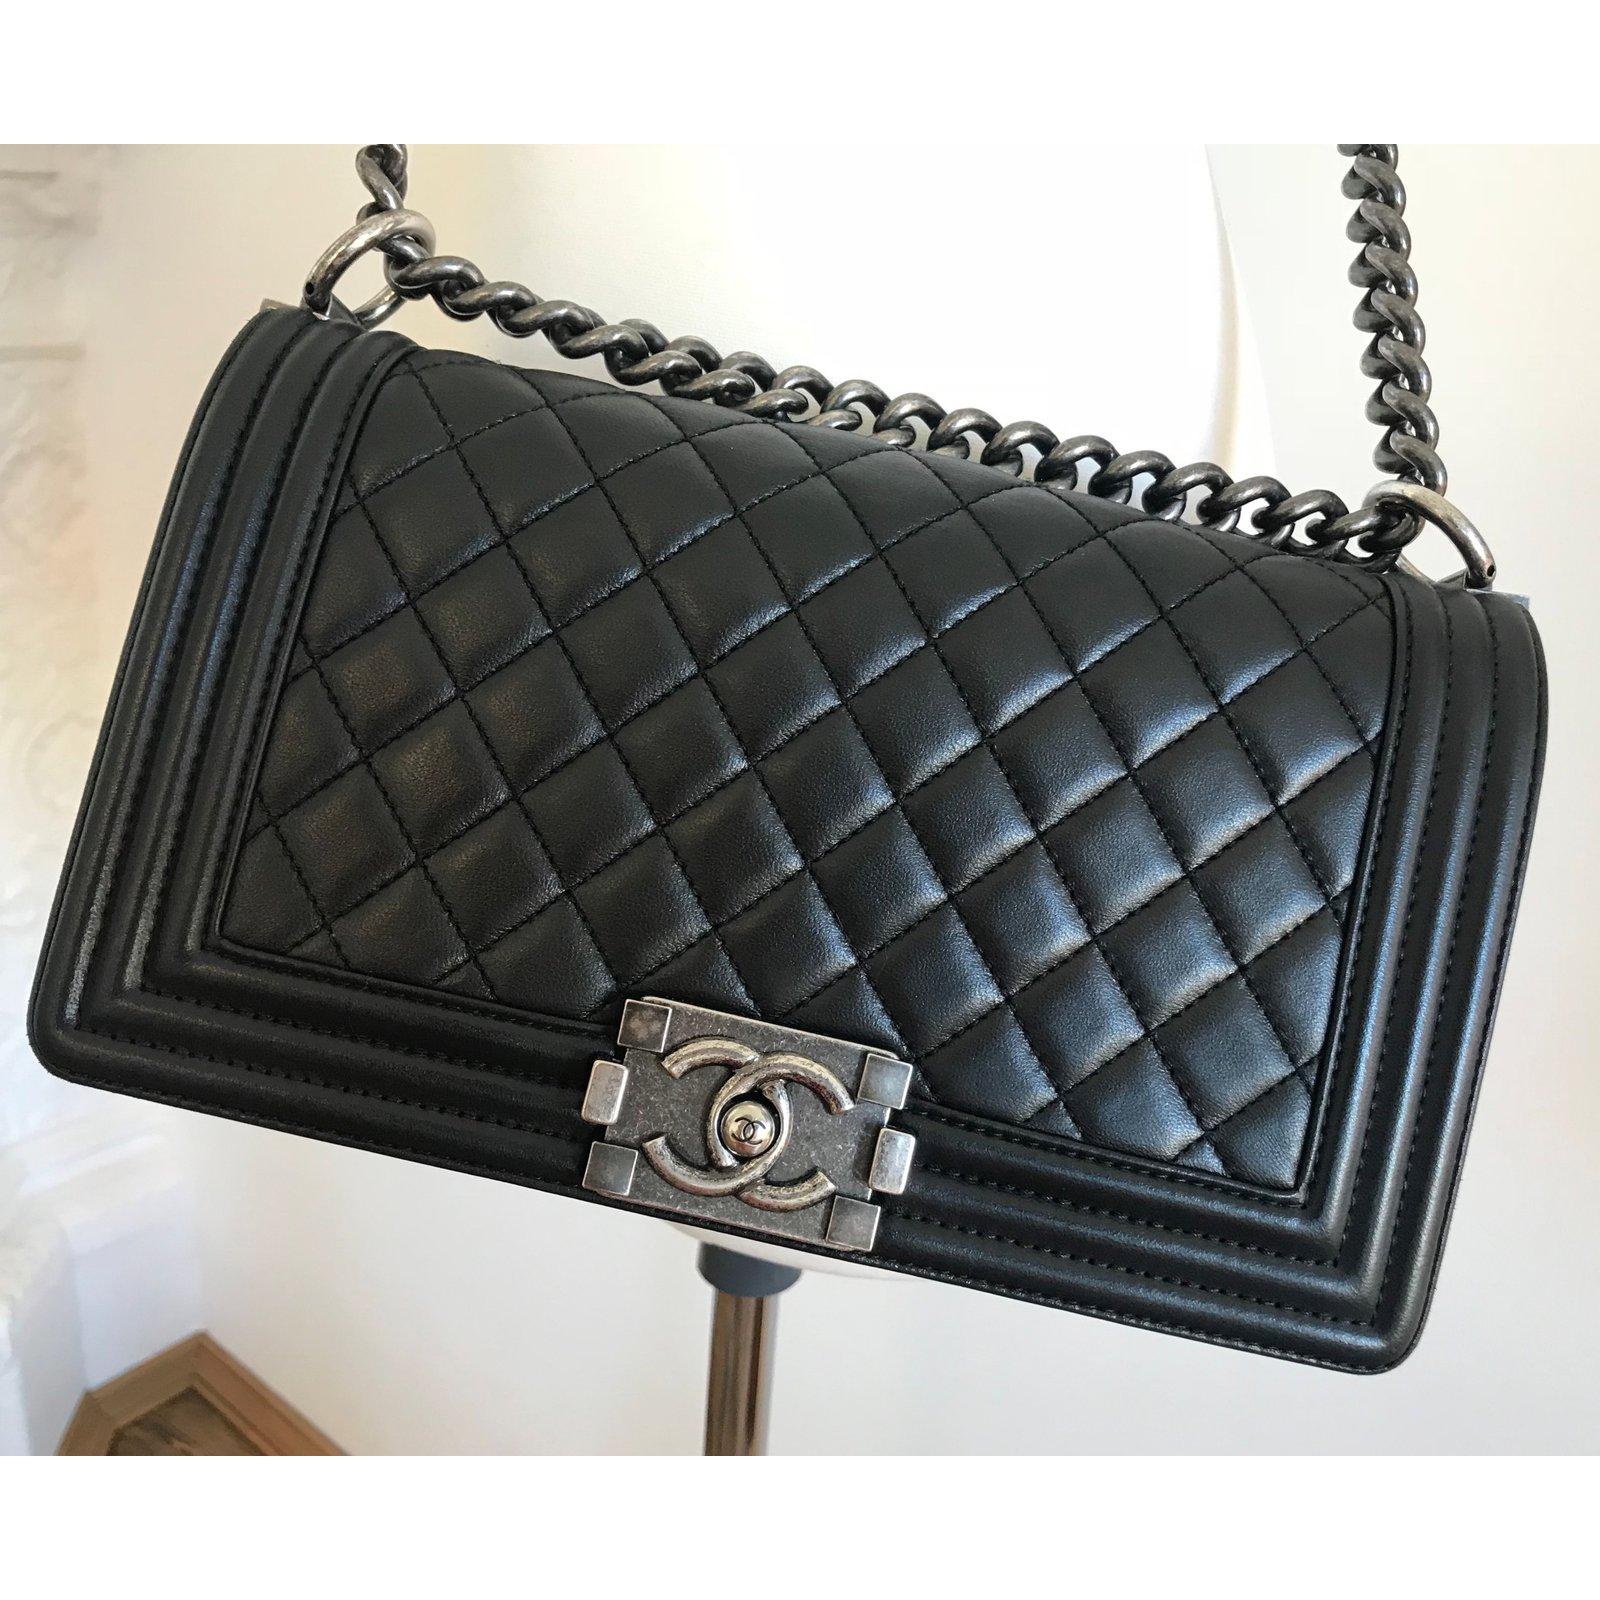 07ff420726a7 Chanel Medium Boy Bag Handbags Lambskin Black Ref 68514 Joli Closet